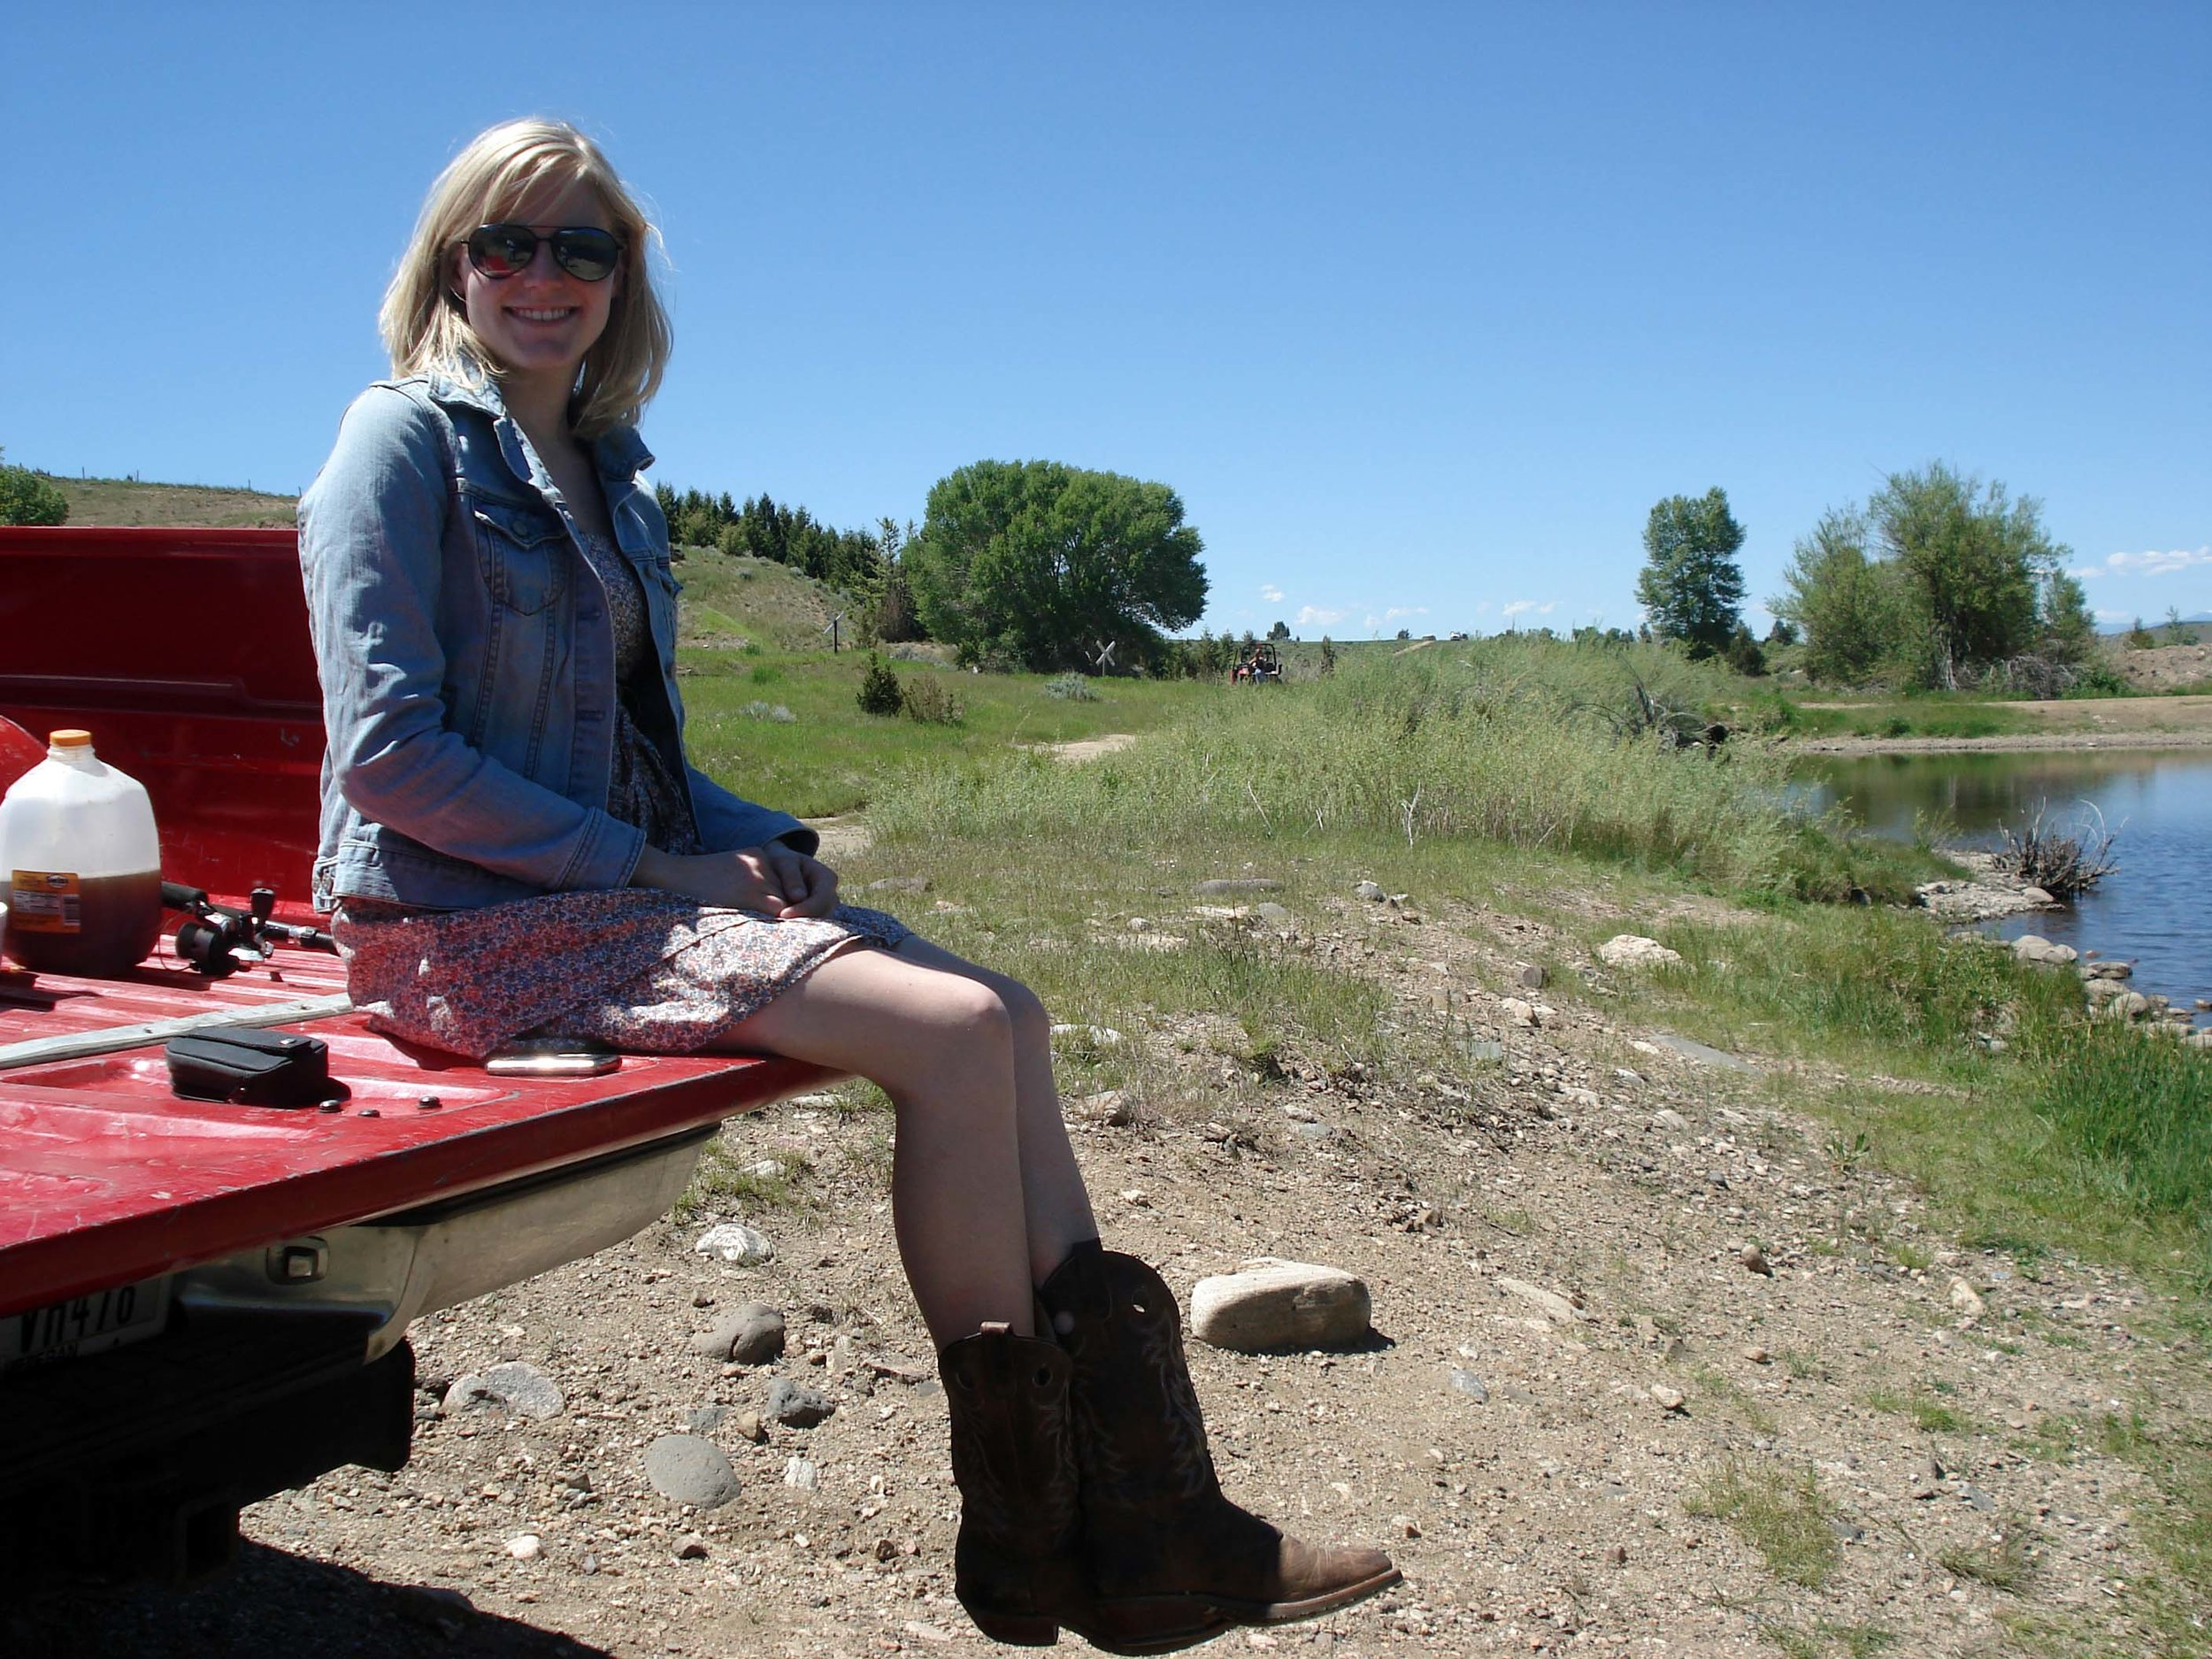 Camping at Ruby Reservoir in Southwestern Montana near Virginia City, Montana